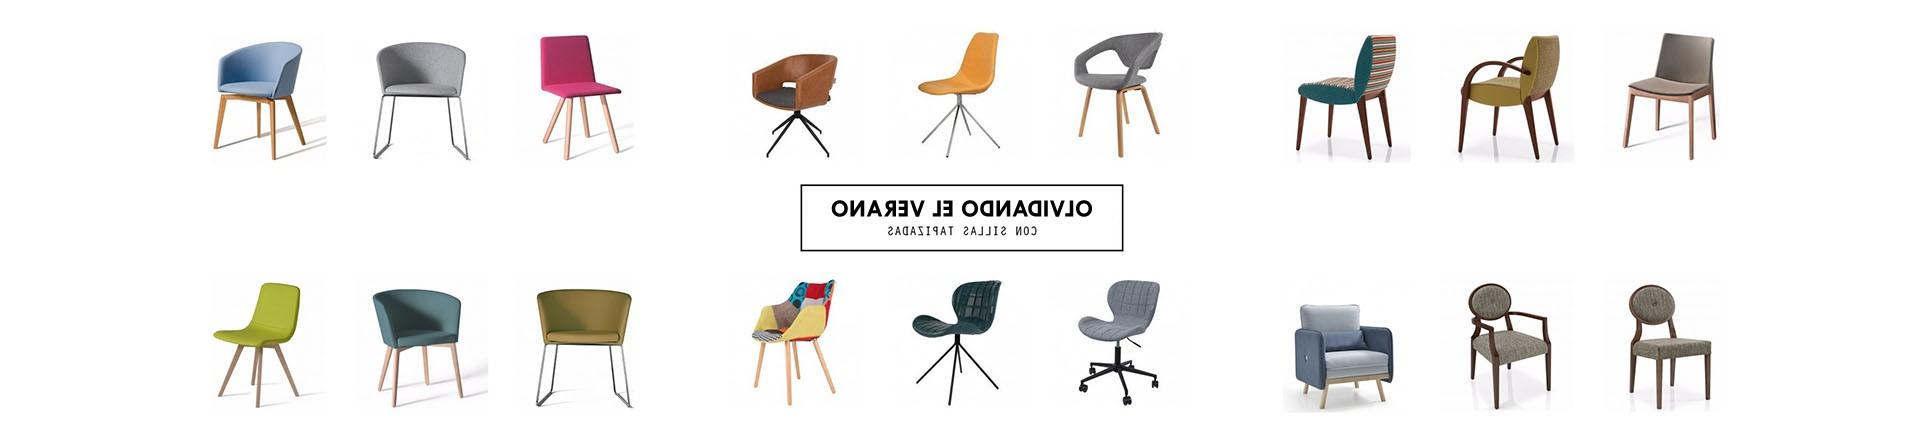 Sillas Online S1du Sillas Modernas Y De Diseà O Para Prar Online Loftchair